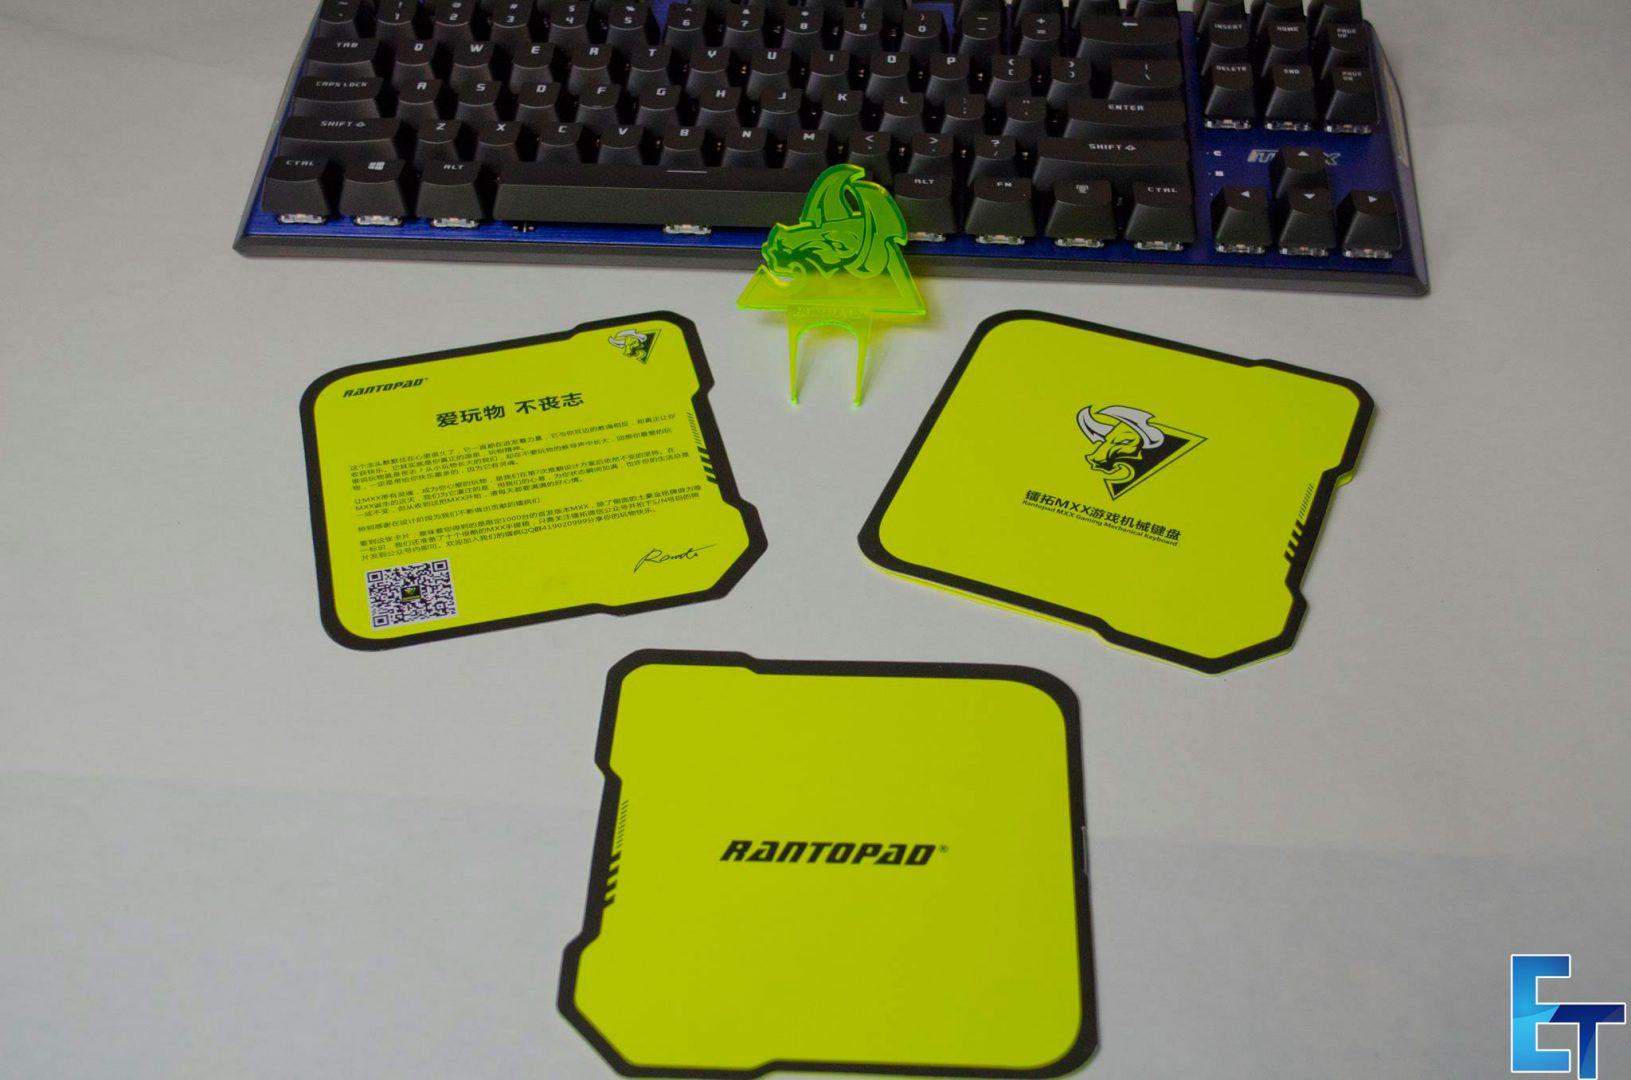 Rantopad-MXX-Gaming-Mechanical-Keyboard_4